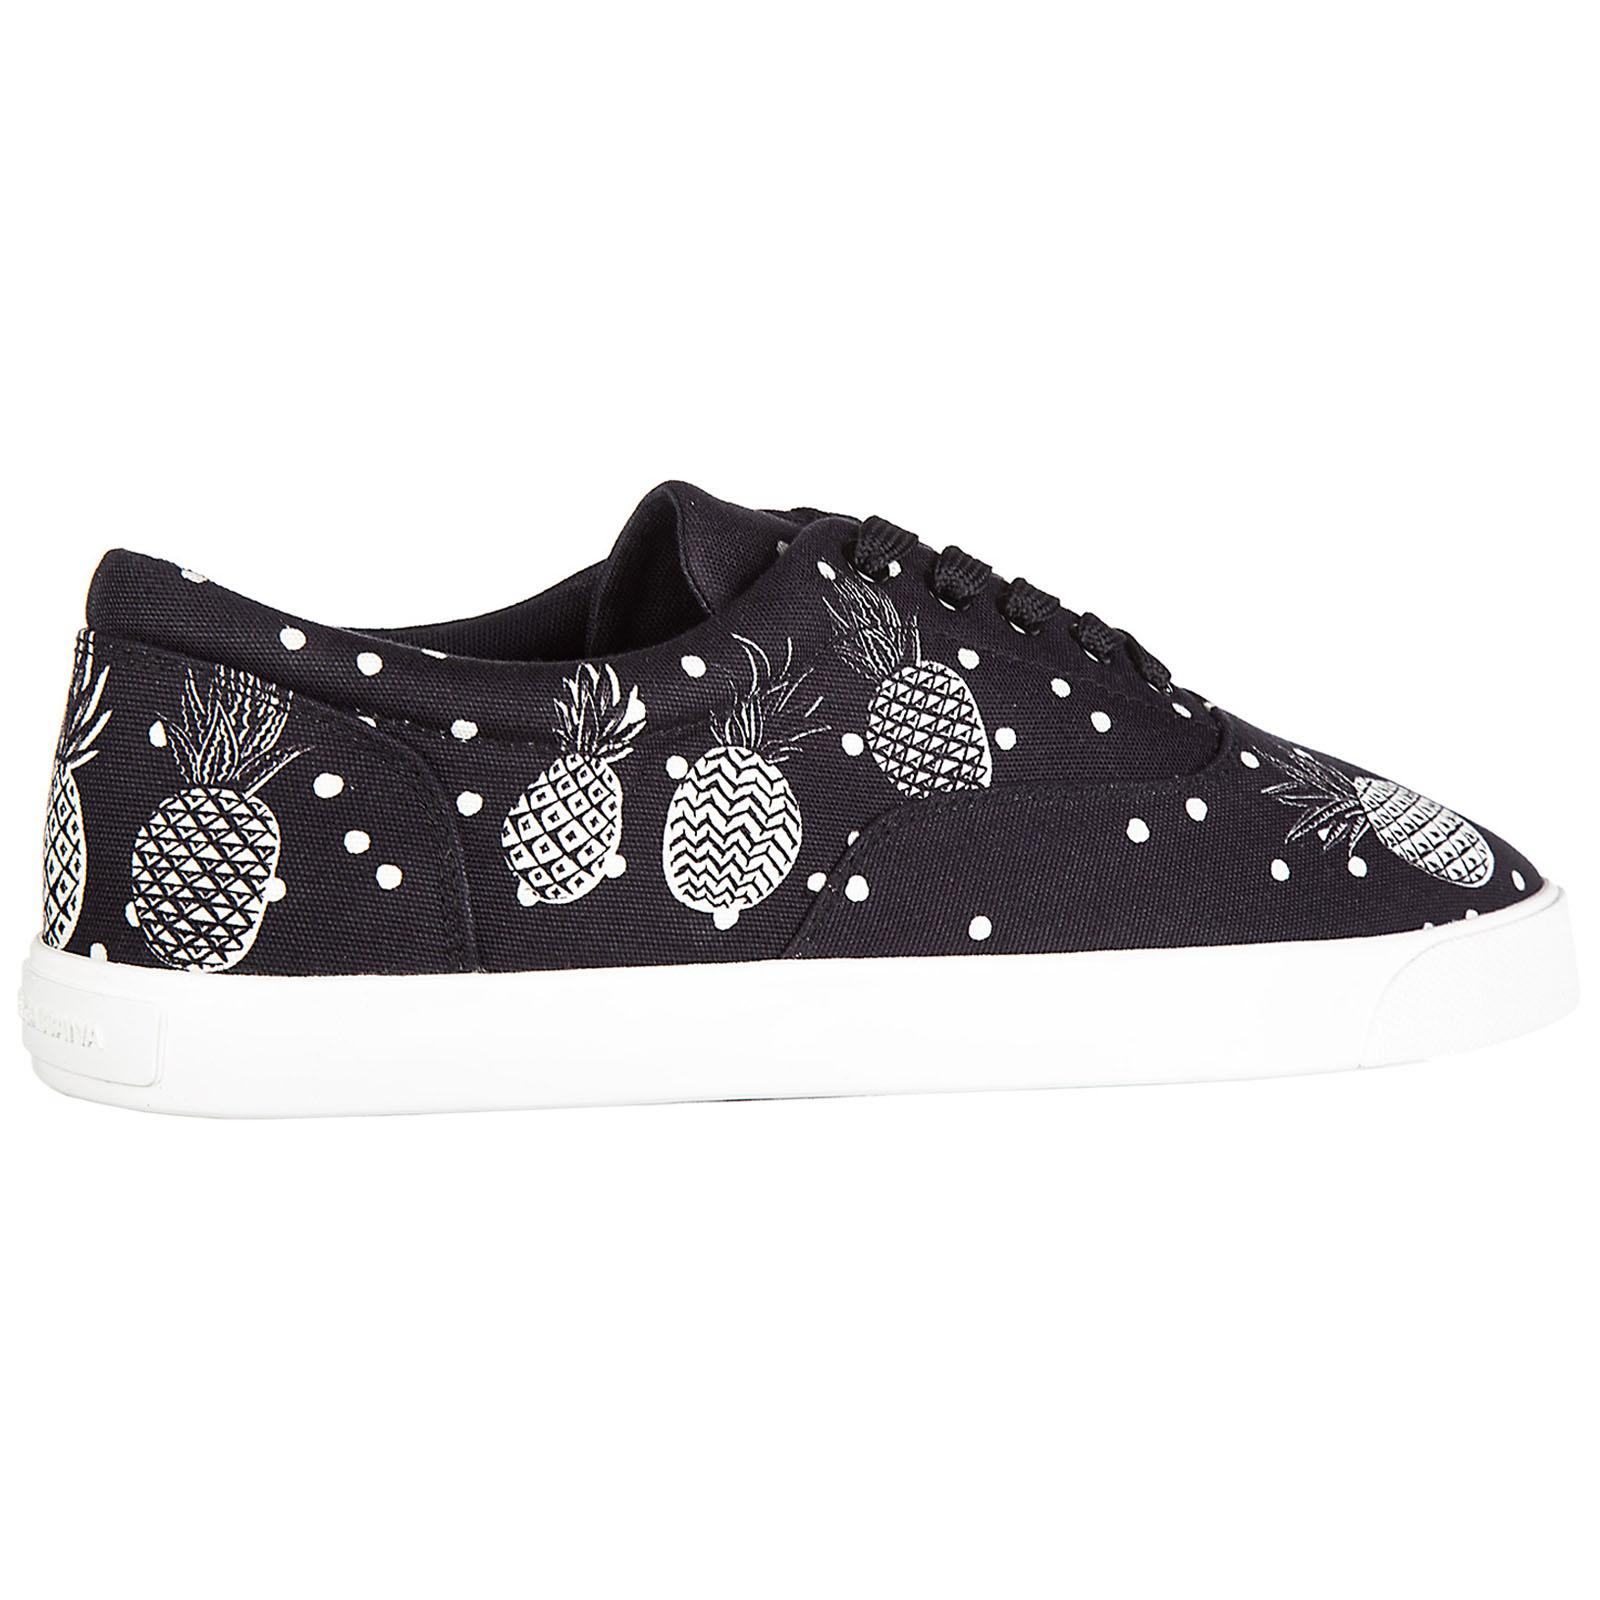 Chaussures baskets sneakers homme en coton brooklyn strobel